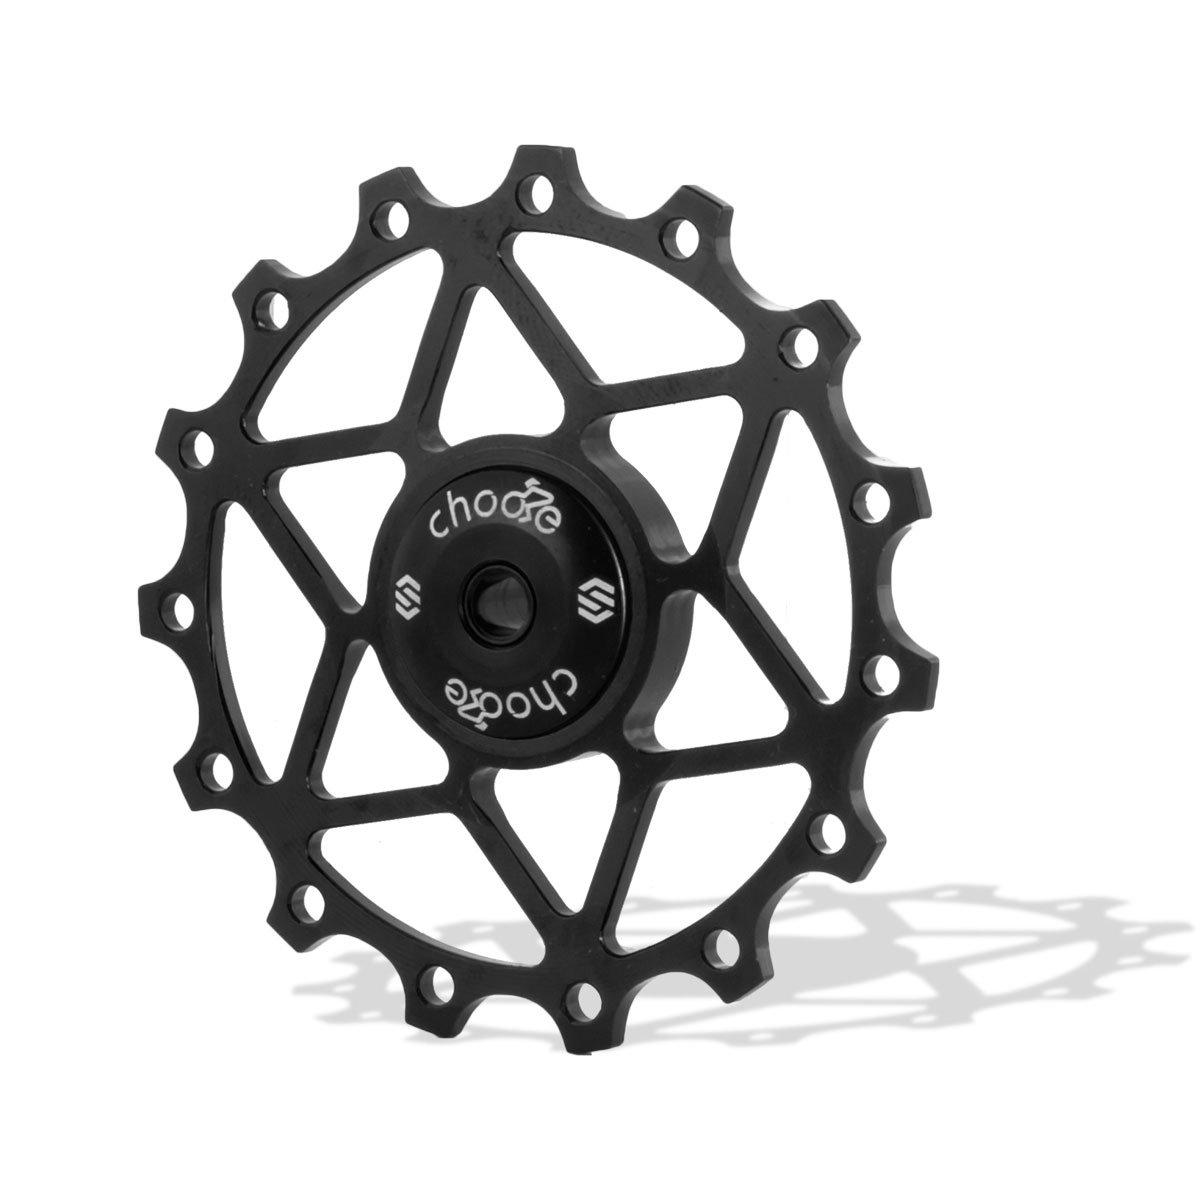 Chooee Black Ceramic Bearing 15T Rear Derailleur Jockey Wheel Pulley Shimano SRAM by Chooee